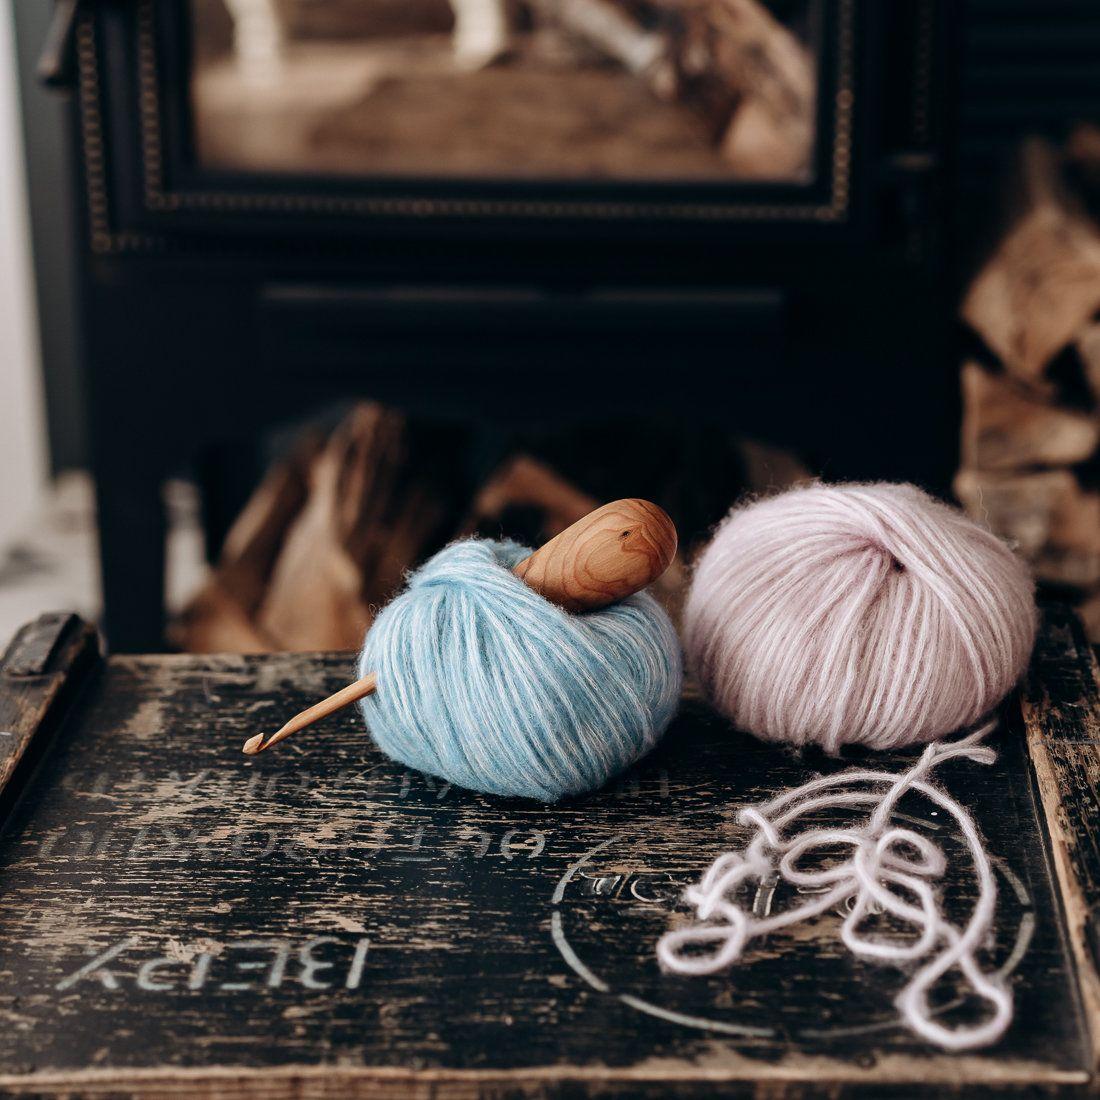 Rowan wood 1.6 mm. Steel crochet hook with wooden handle for crocheting